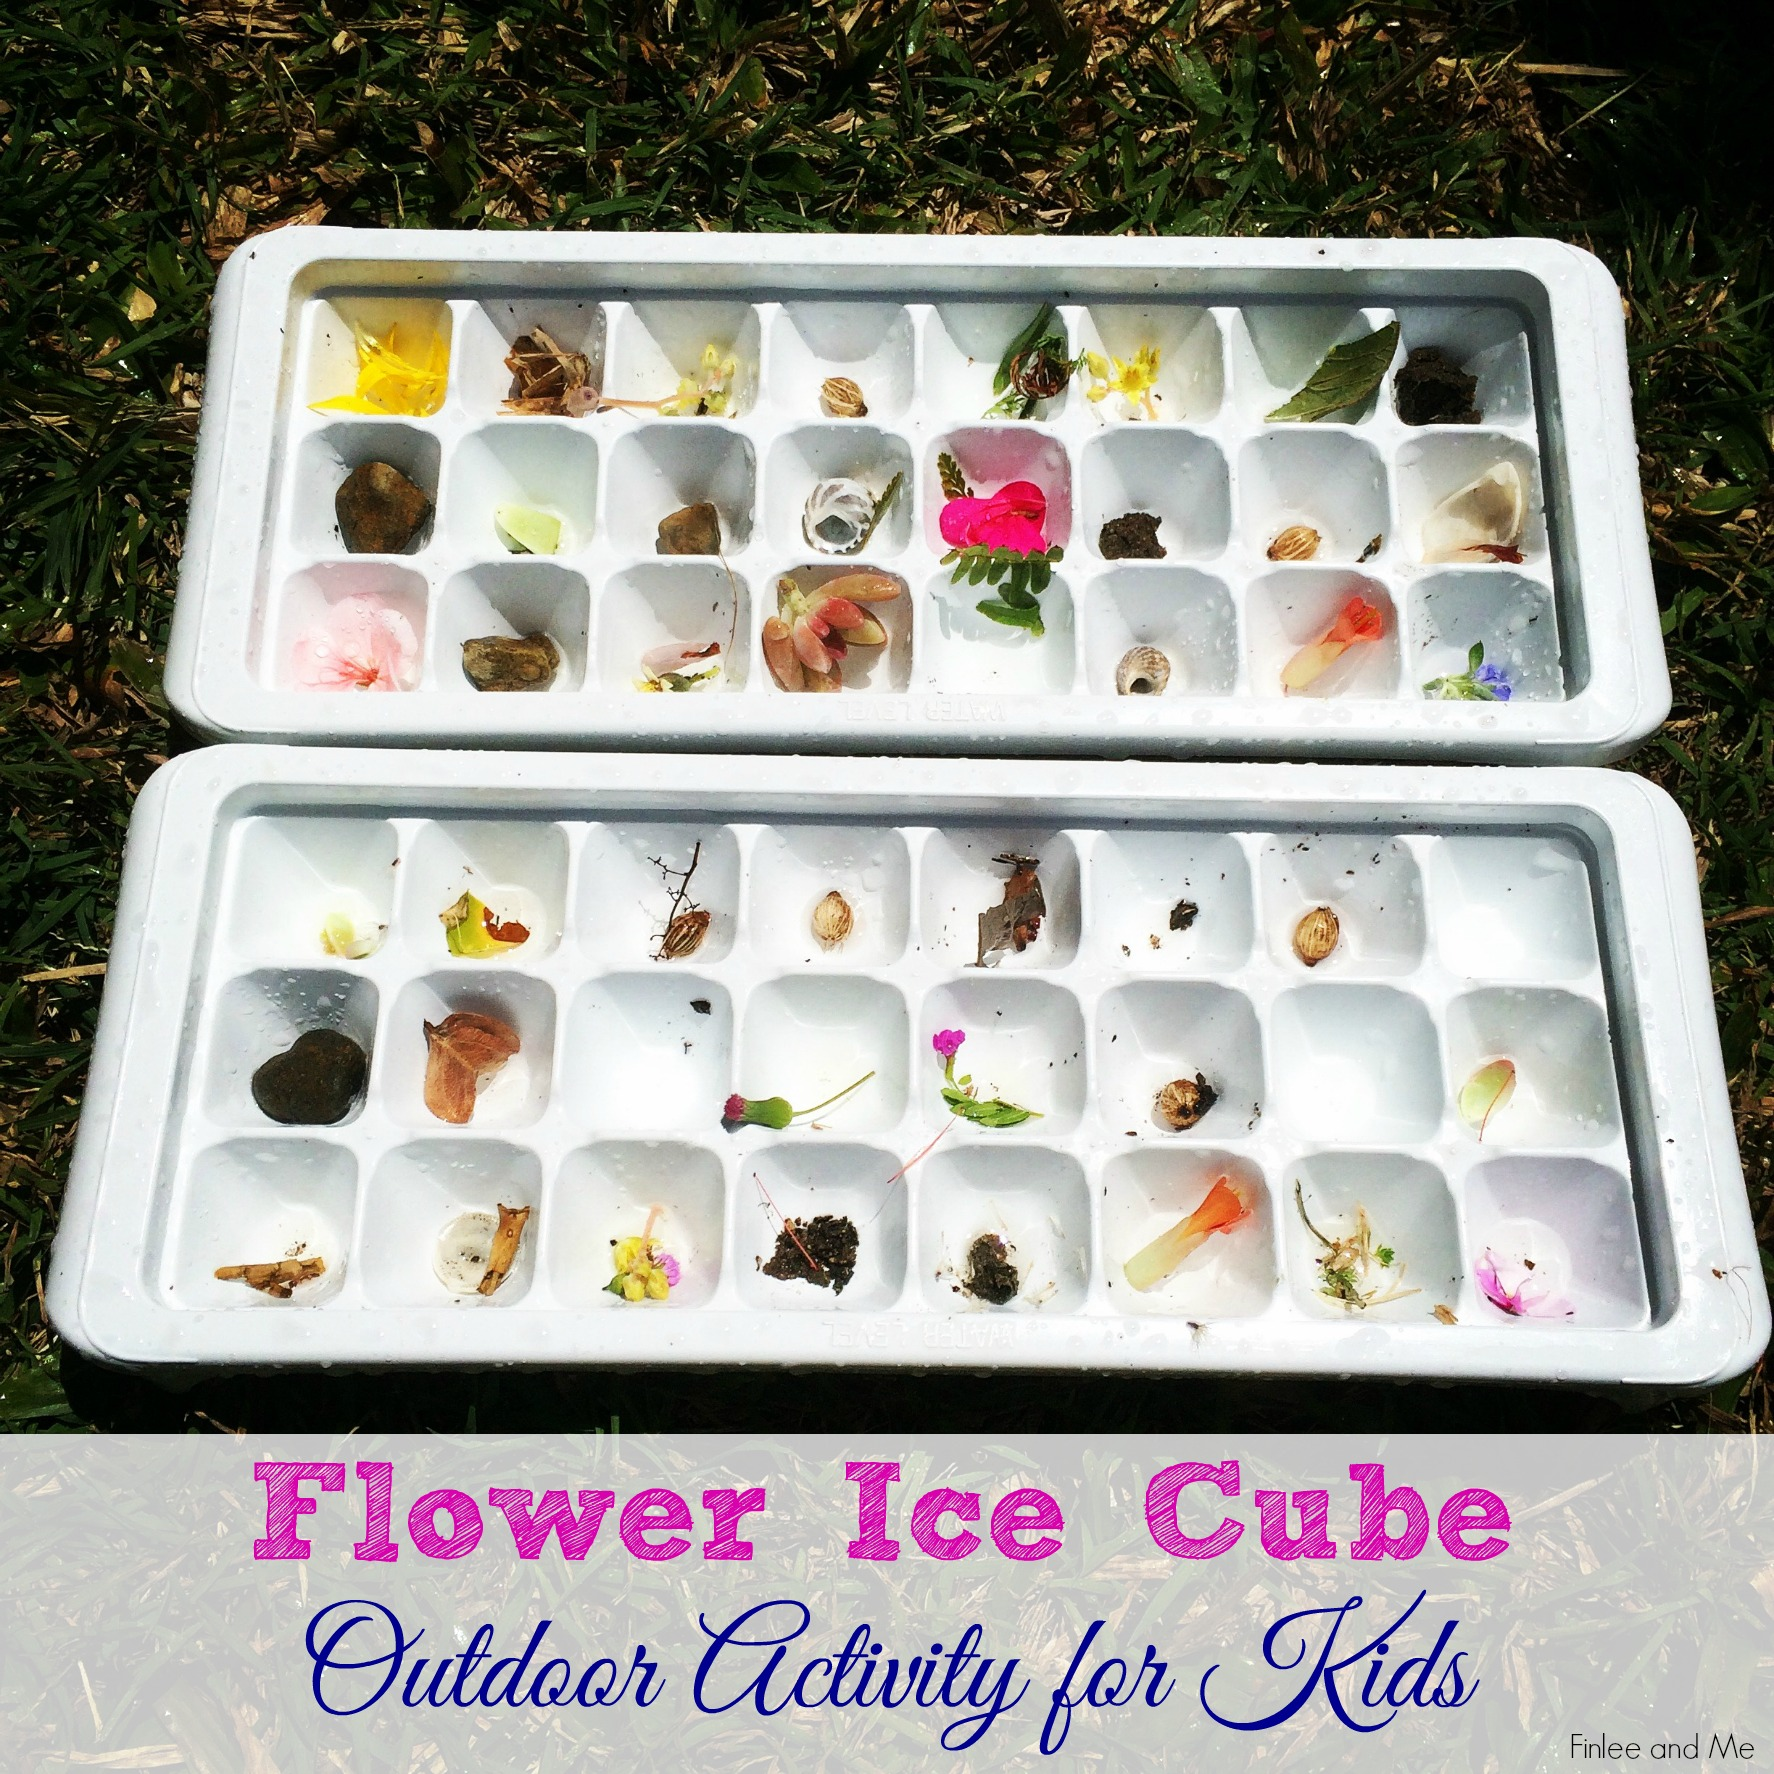 Flower Ice Cubes Outdoor Activities for Kids